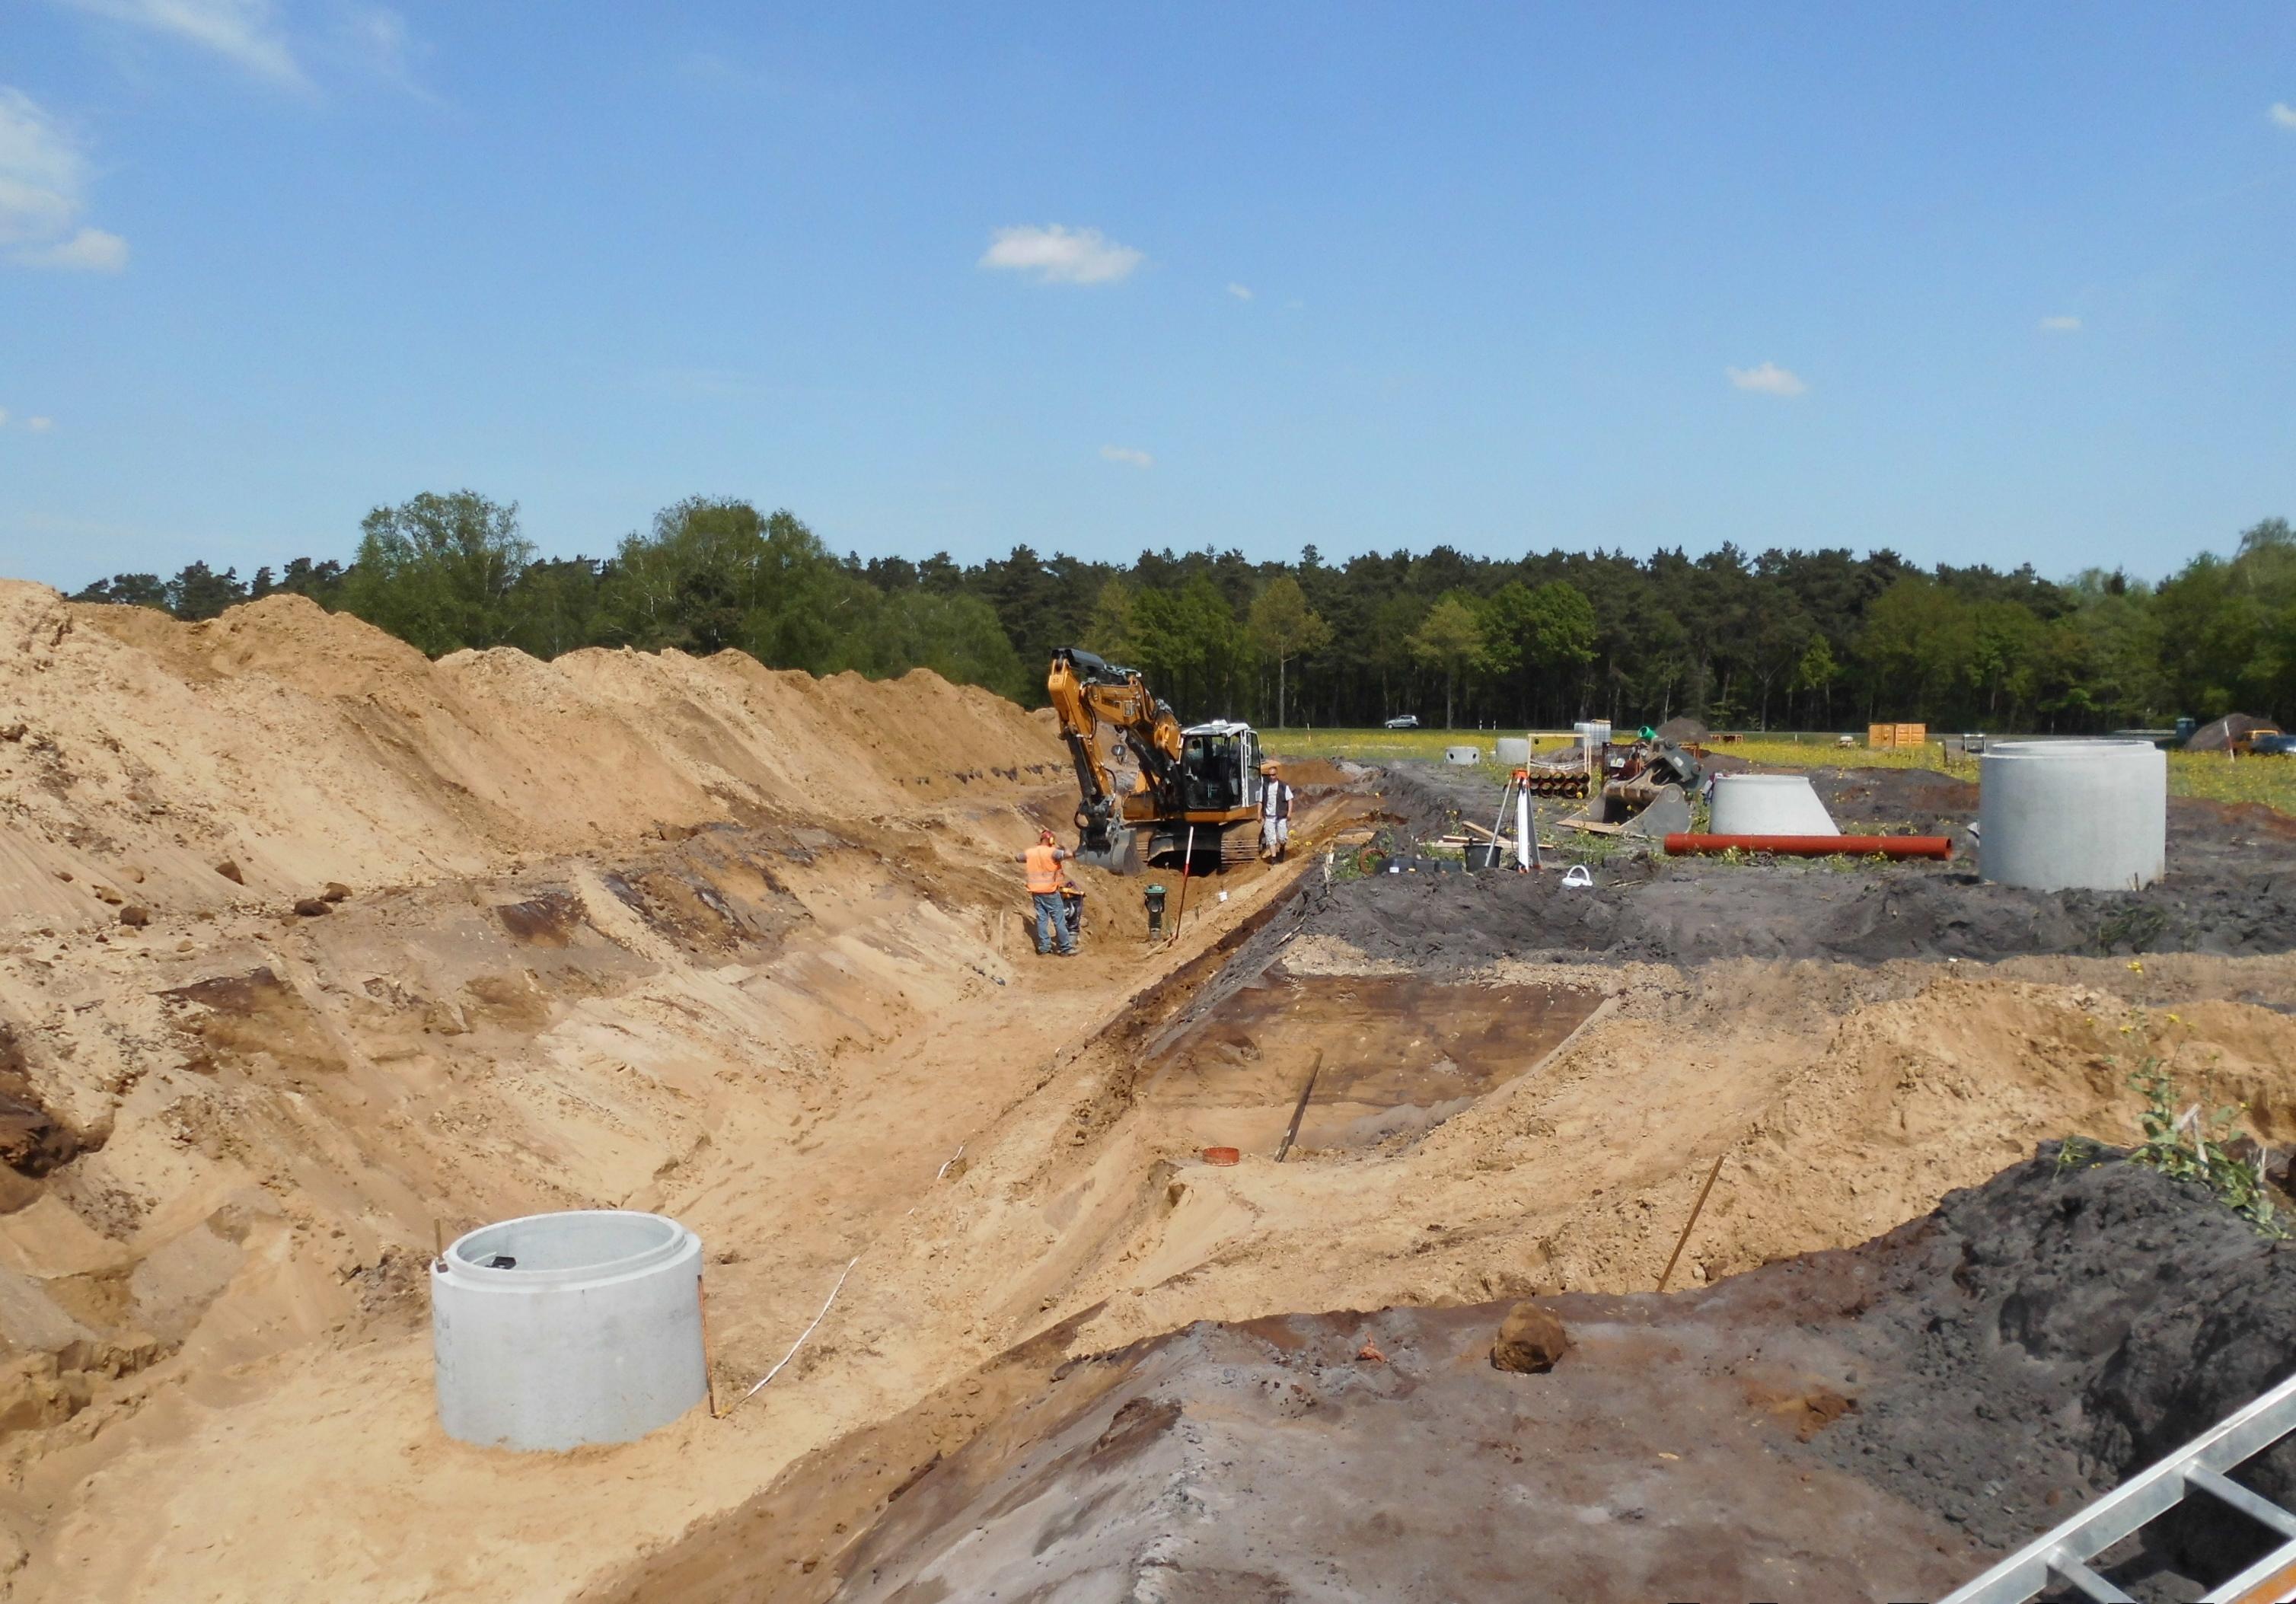 Erschließung Baugebiet Scheeßeler Weg in der Gemeinde Brockel IDN-Projekt 5397